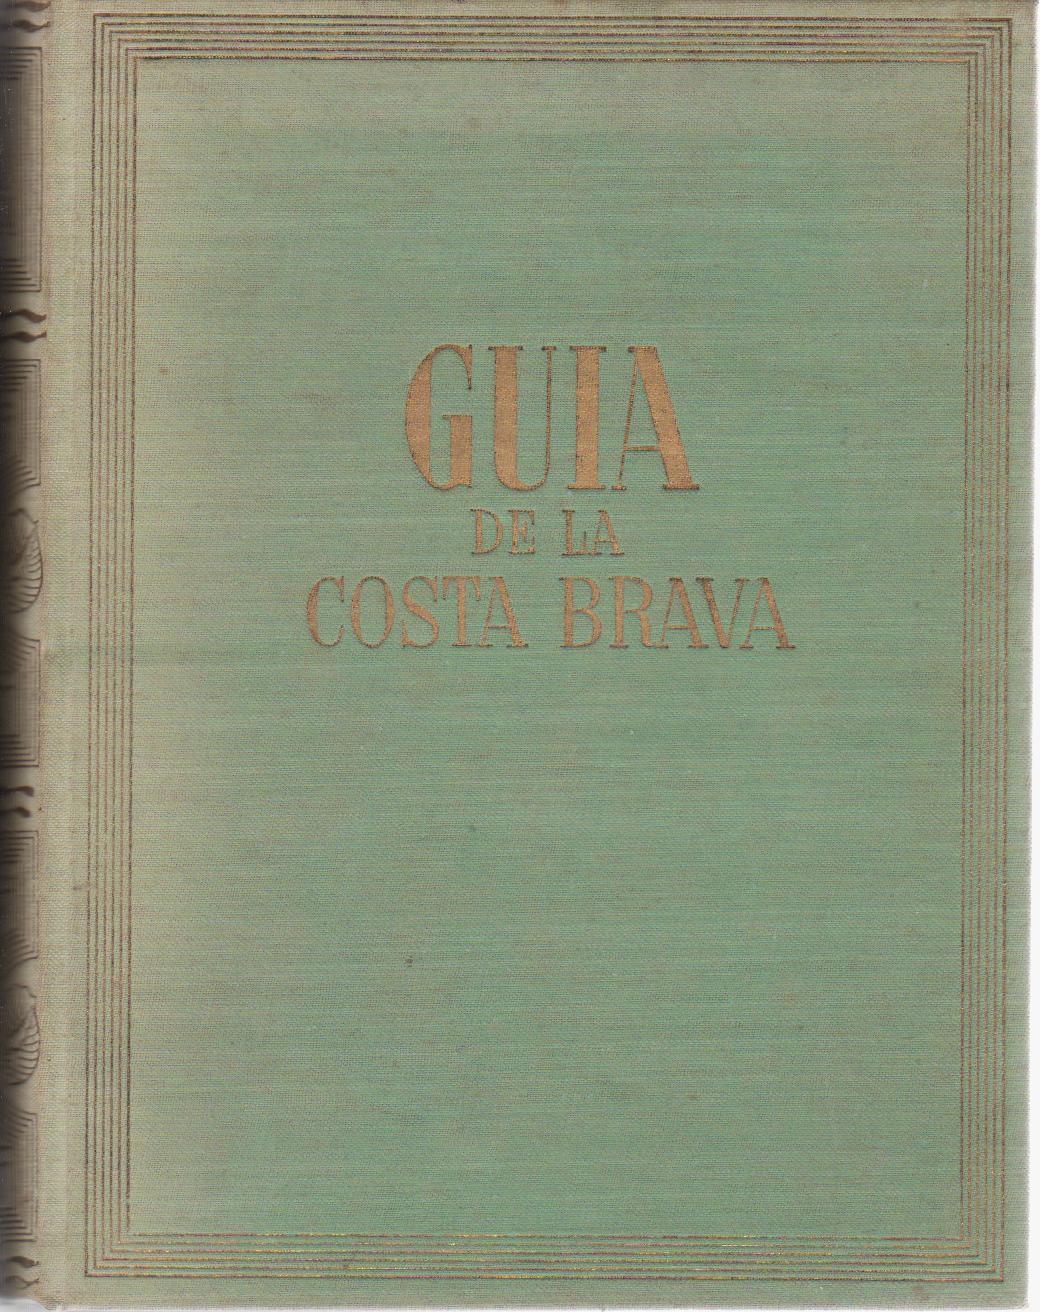 Guía de la Costa Brava